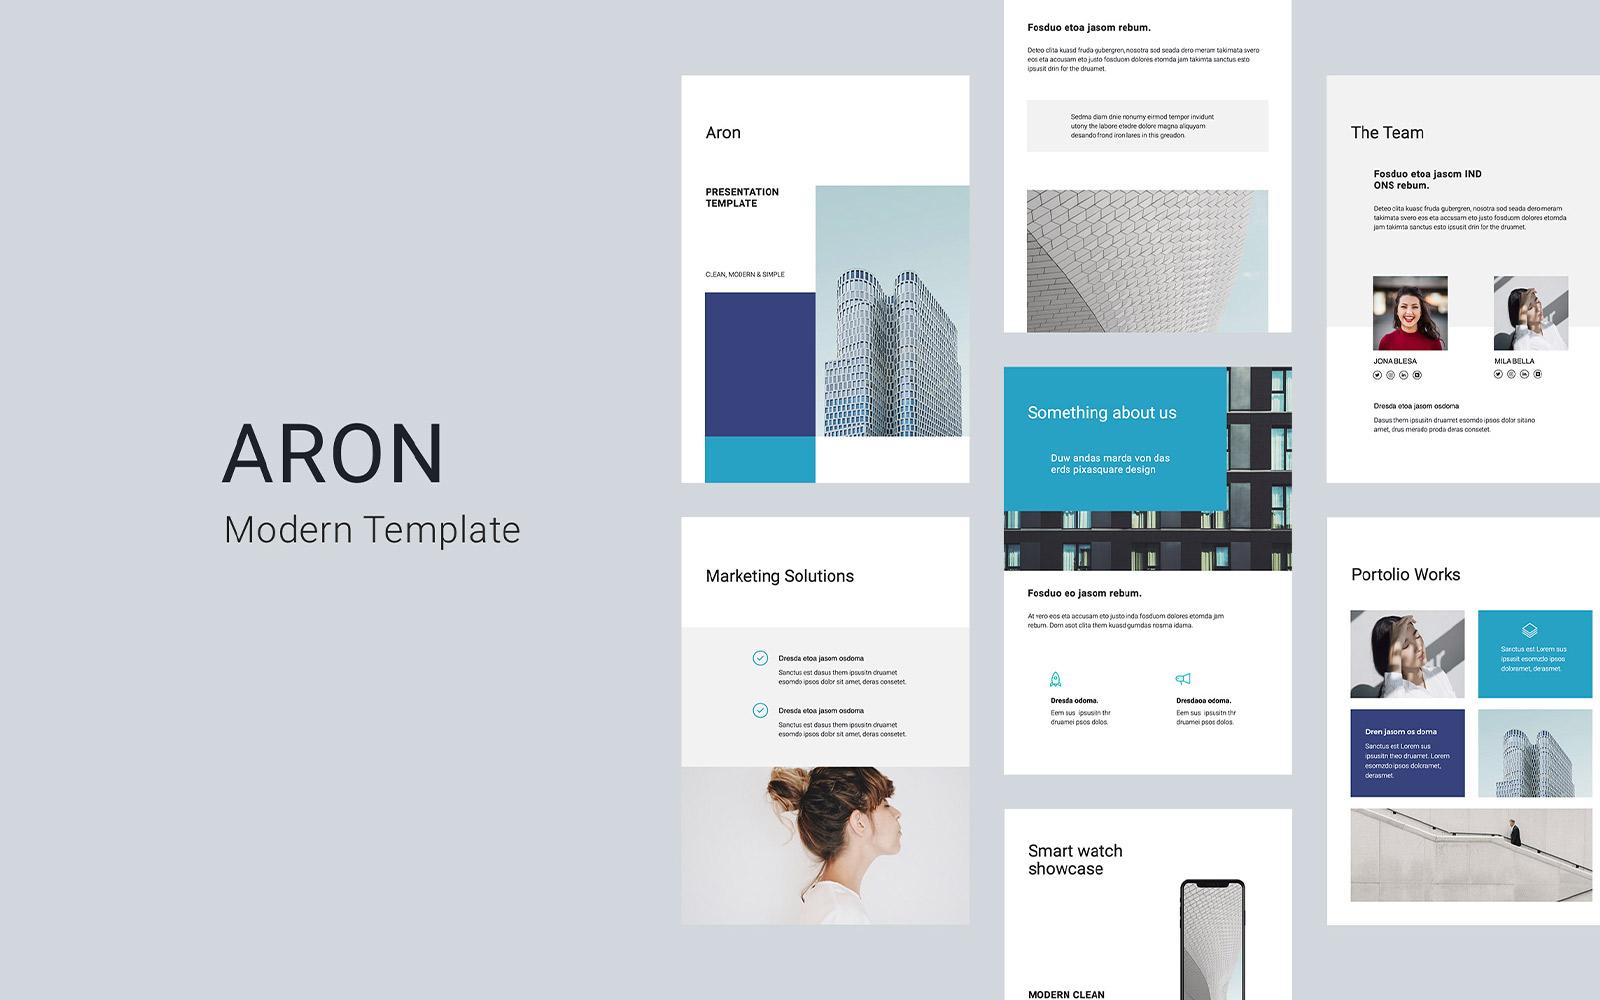 ARON - A4 Vertical PowerPoint Template